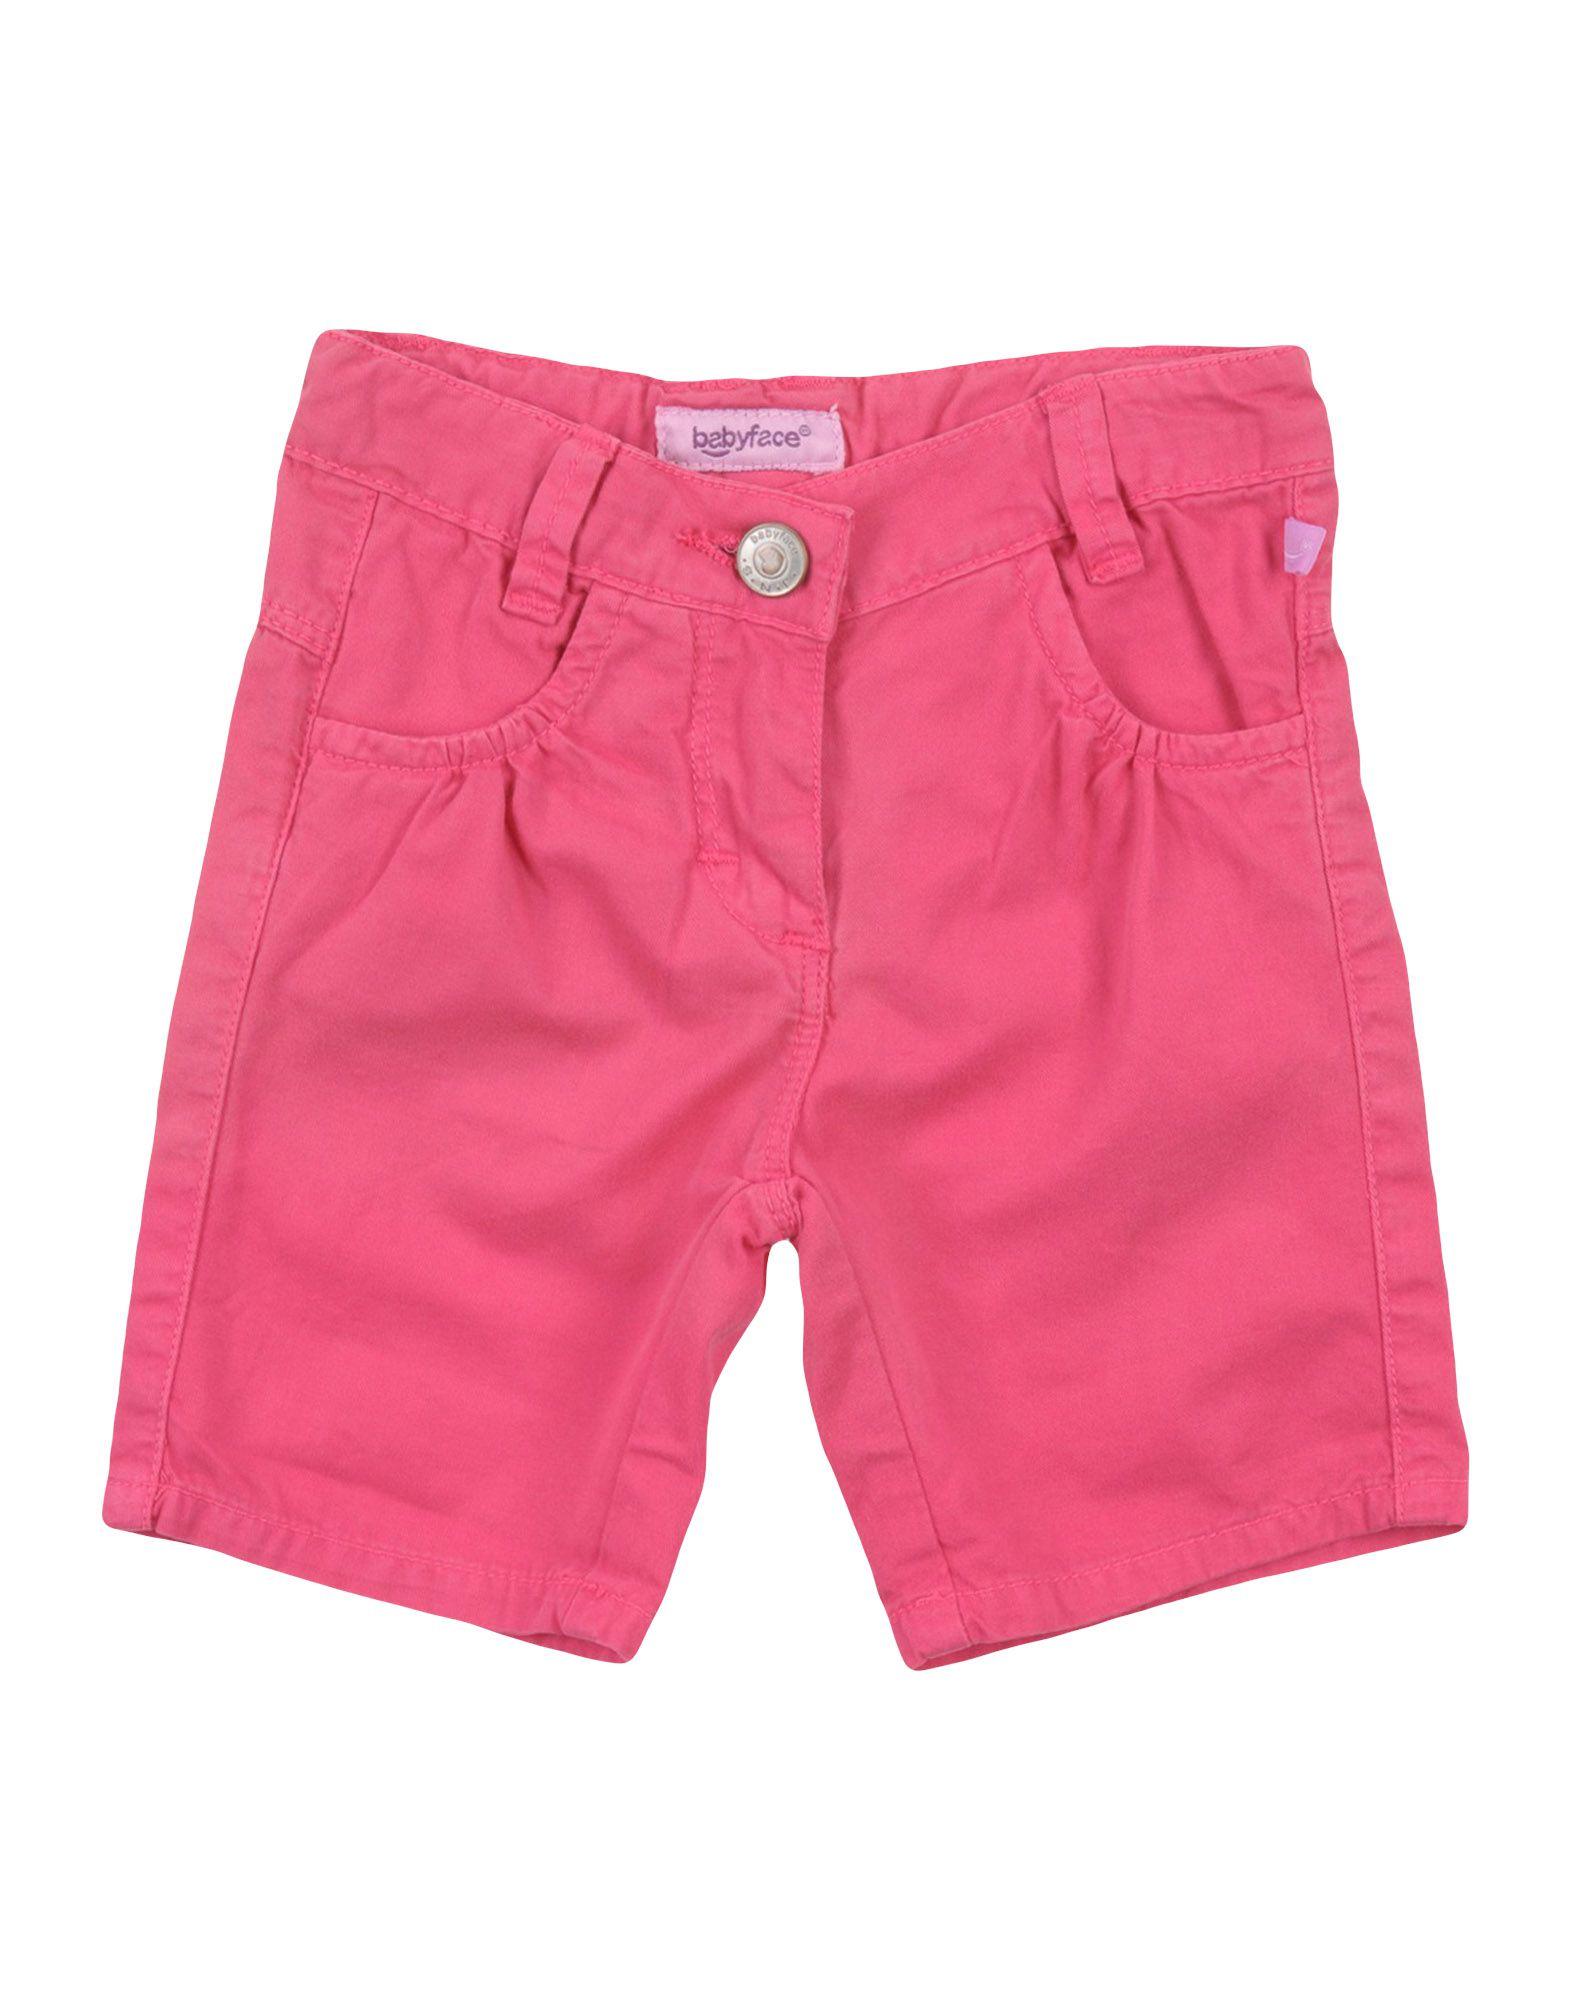 e81a9b18e3da Bfc Babyface Shorts & Bermuda Girl 0-24 months online on YOOX Latvia